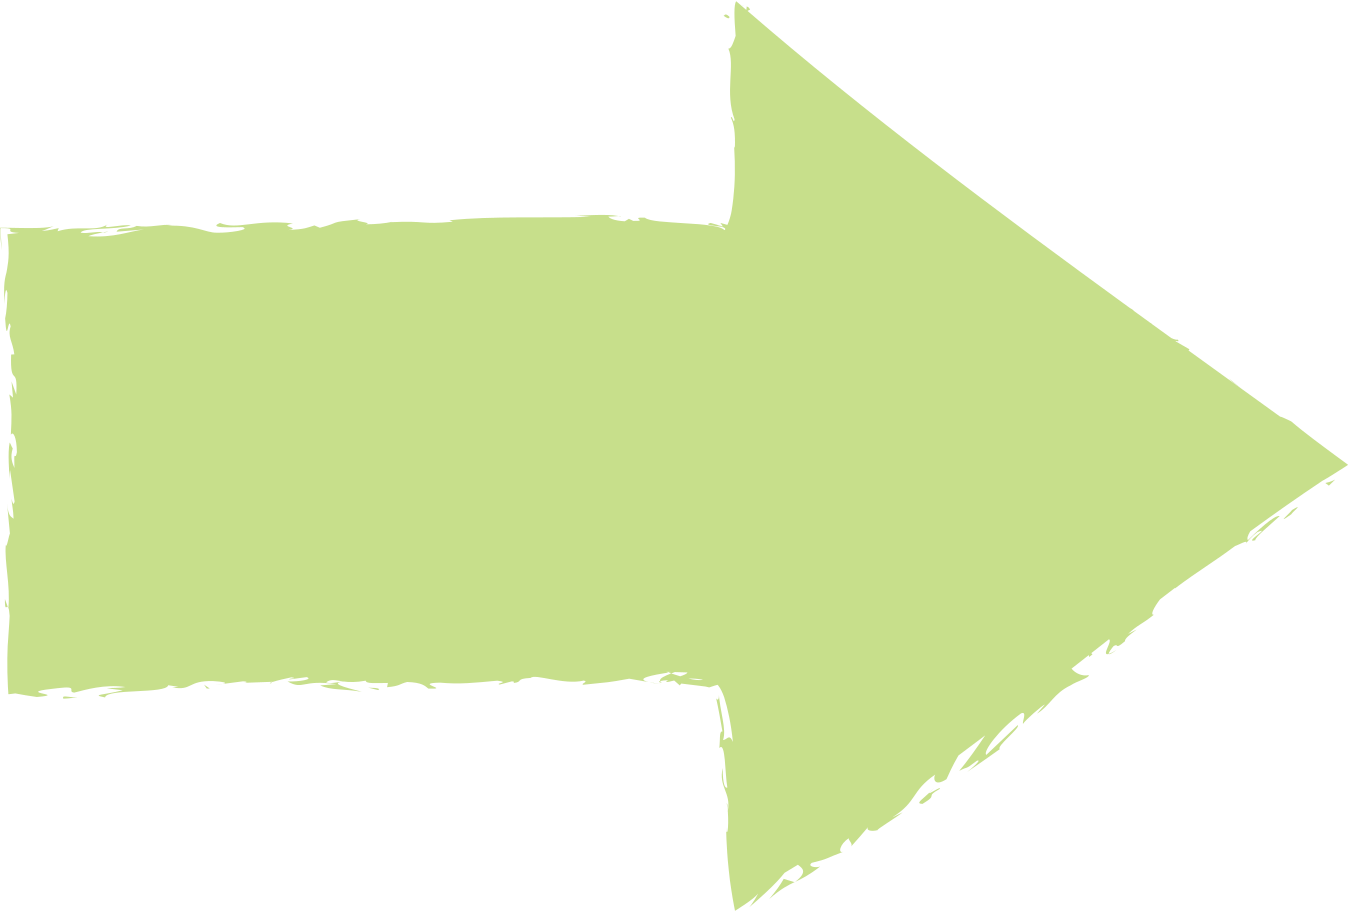 arrow-light-green Clipart illustration in PNG, SVG